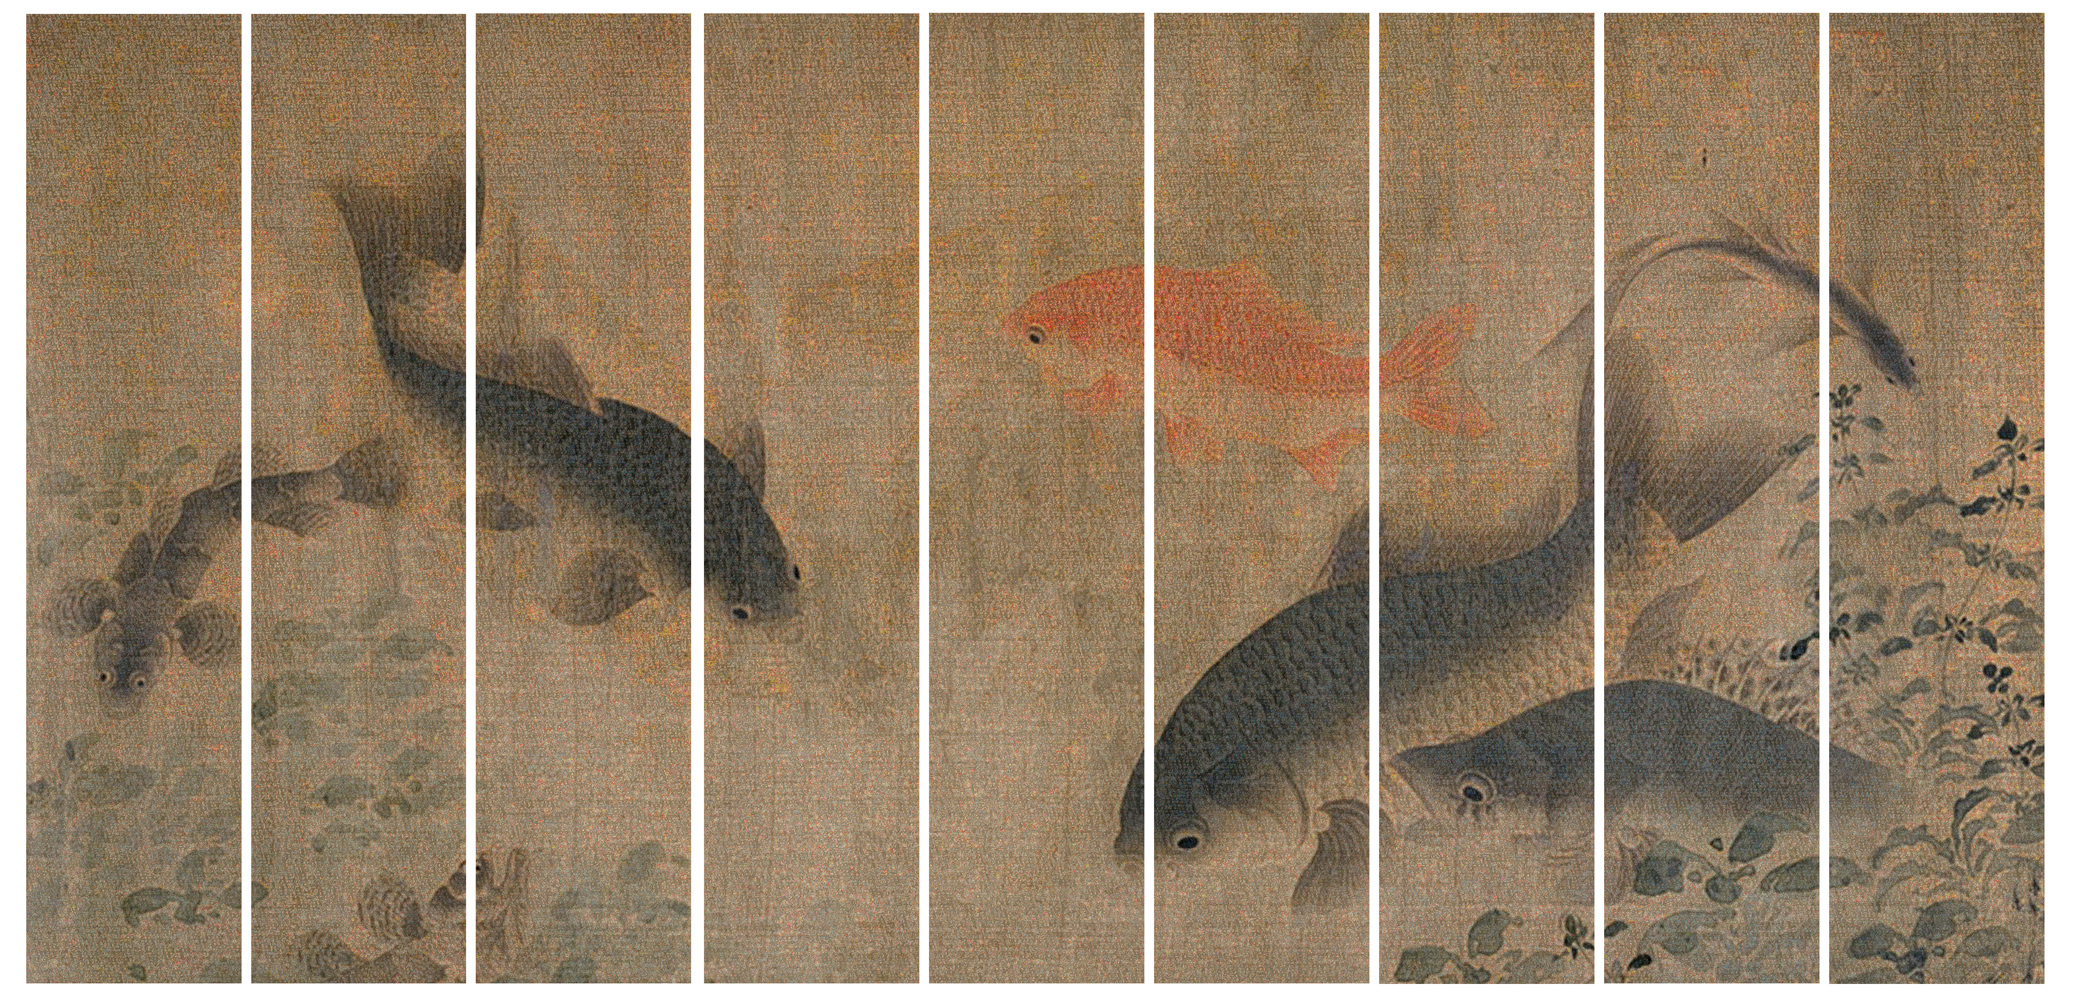 GUO JIAN   The Fish No.2  2014 Inkjet pigment print (9 panels) 200 cm x 399 cm